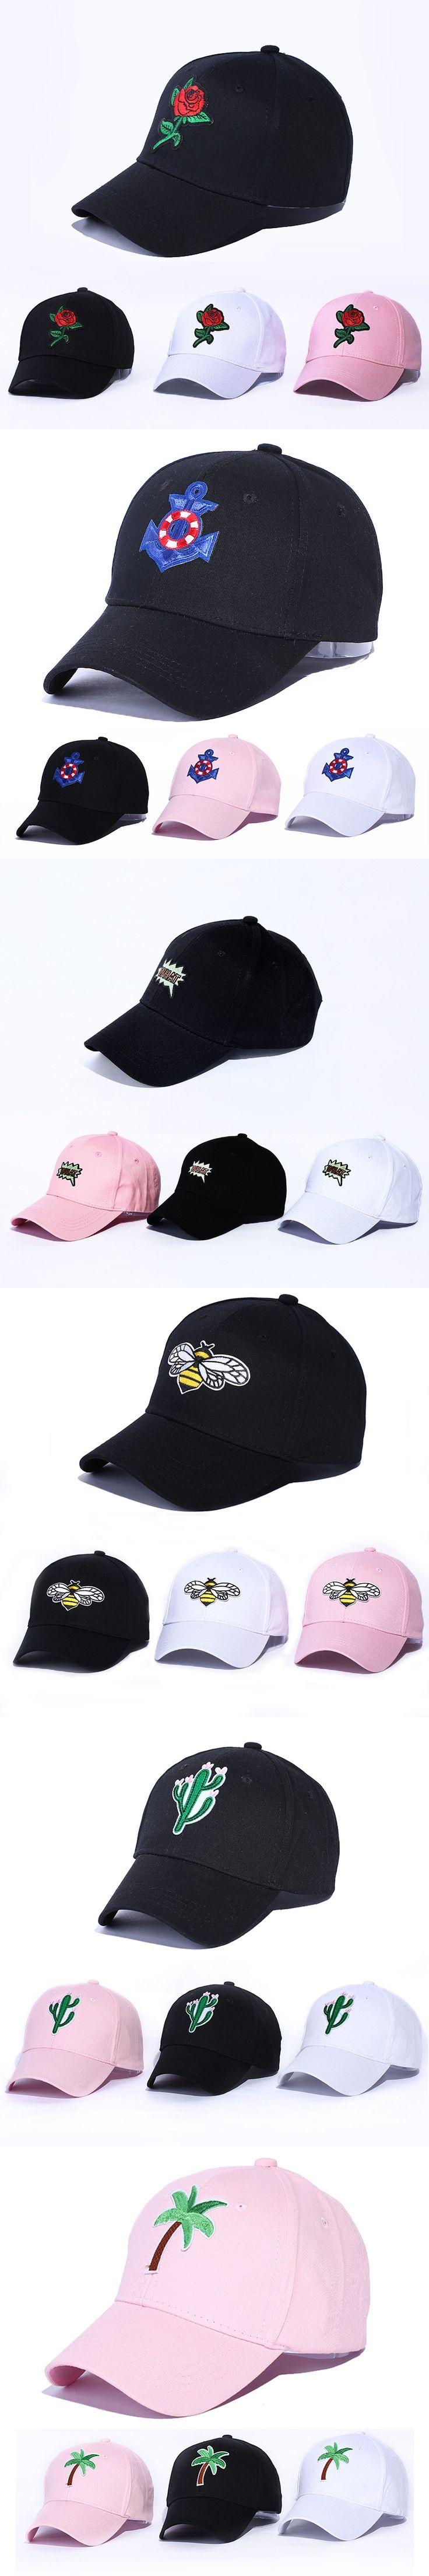 Rose Embroidery Pattern Baseball Caps Snapback Hip Hop Black Dad Cap Designer Original Hats Men Women Visor Hats Bone Adjustable